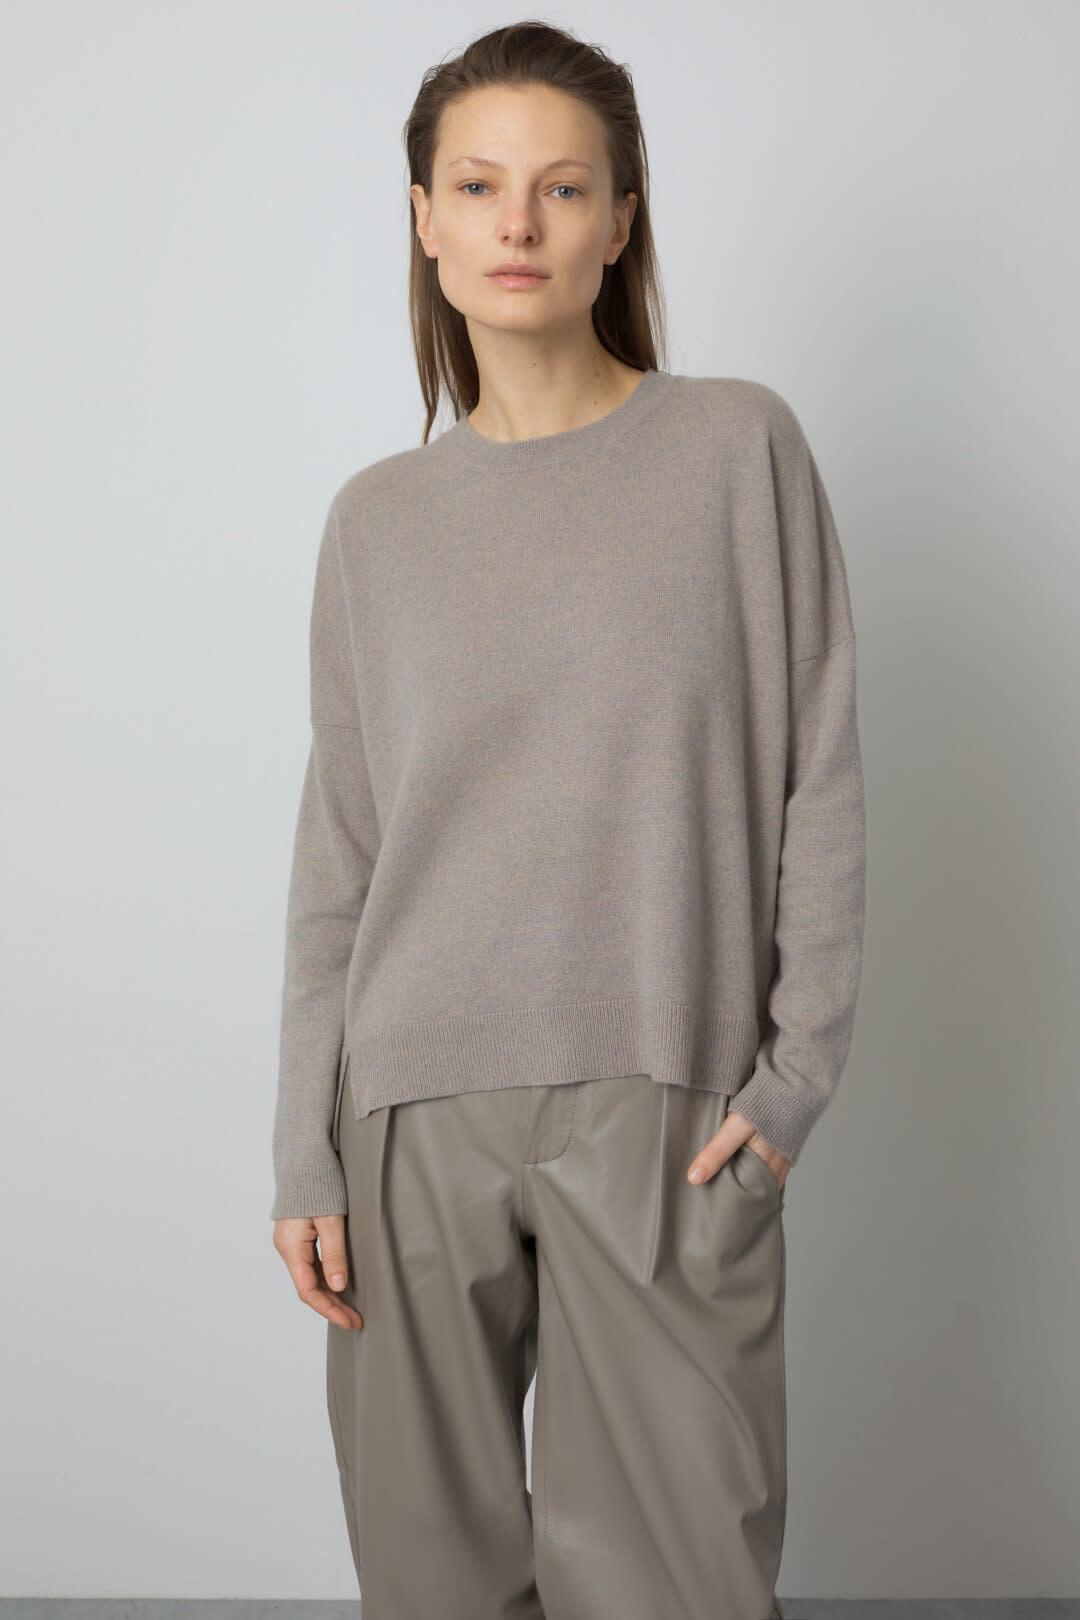 Cashmere Sweater - Muddy Beige-1